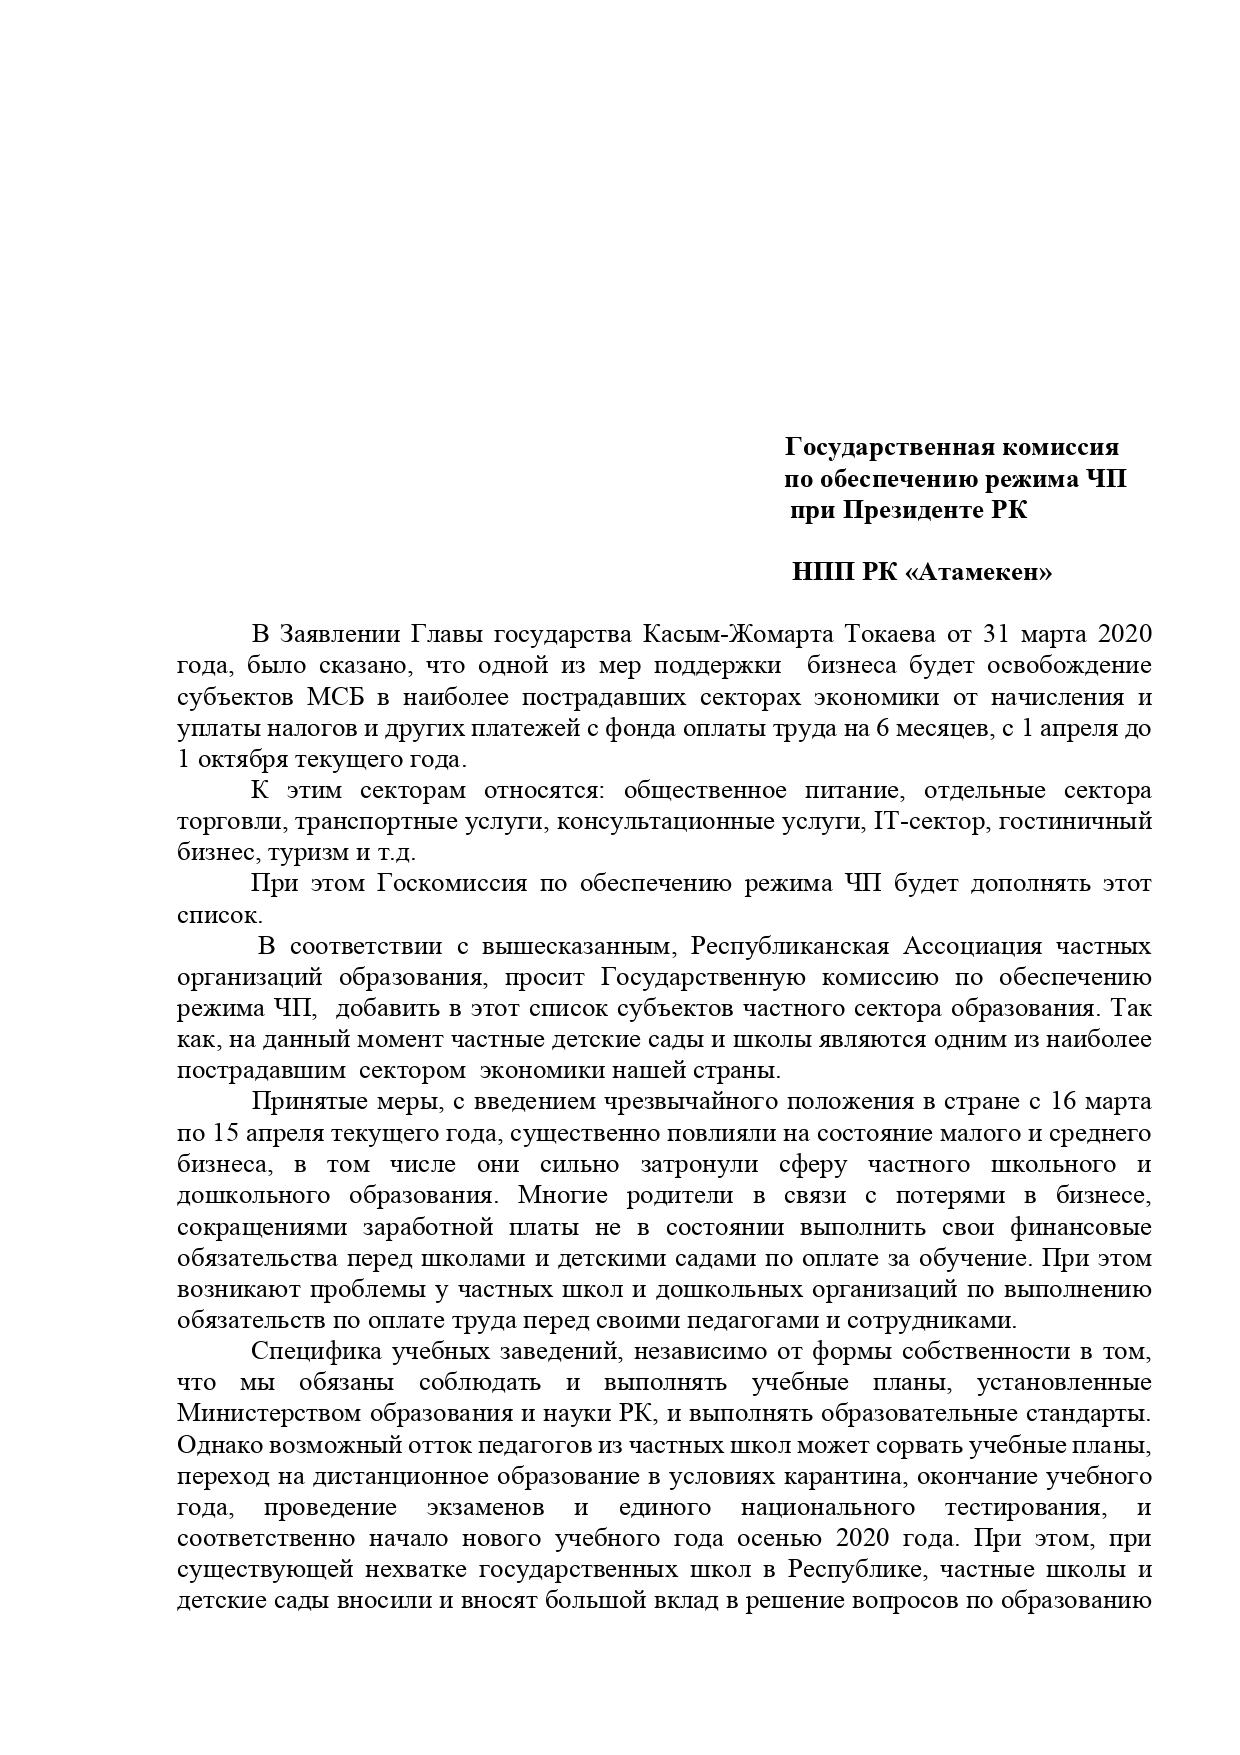 https://inbusiness.kz/ru/images/original/31/images/KSzGxzkP.jpg